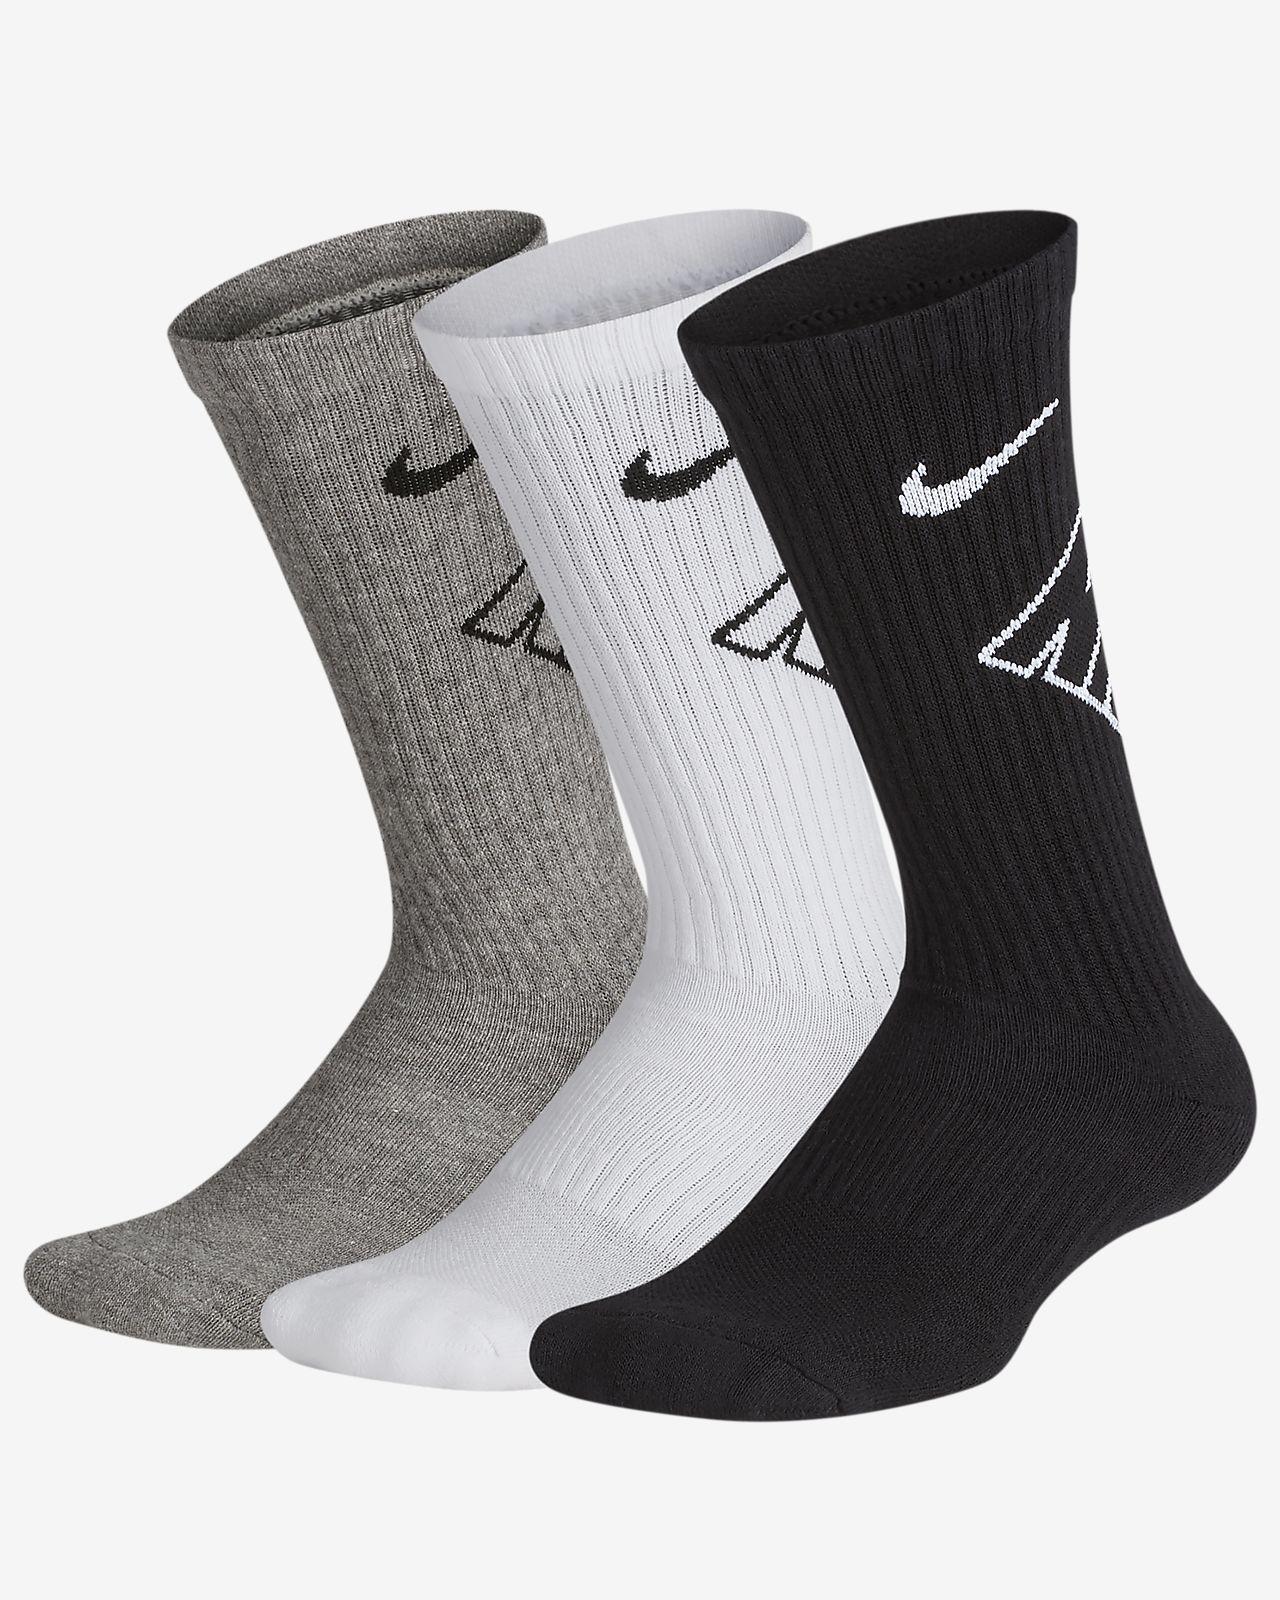 ce9a46e5c Nike Performance Cushioned Crew Kids' Training Socks (3 Pair). Nike.com